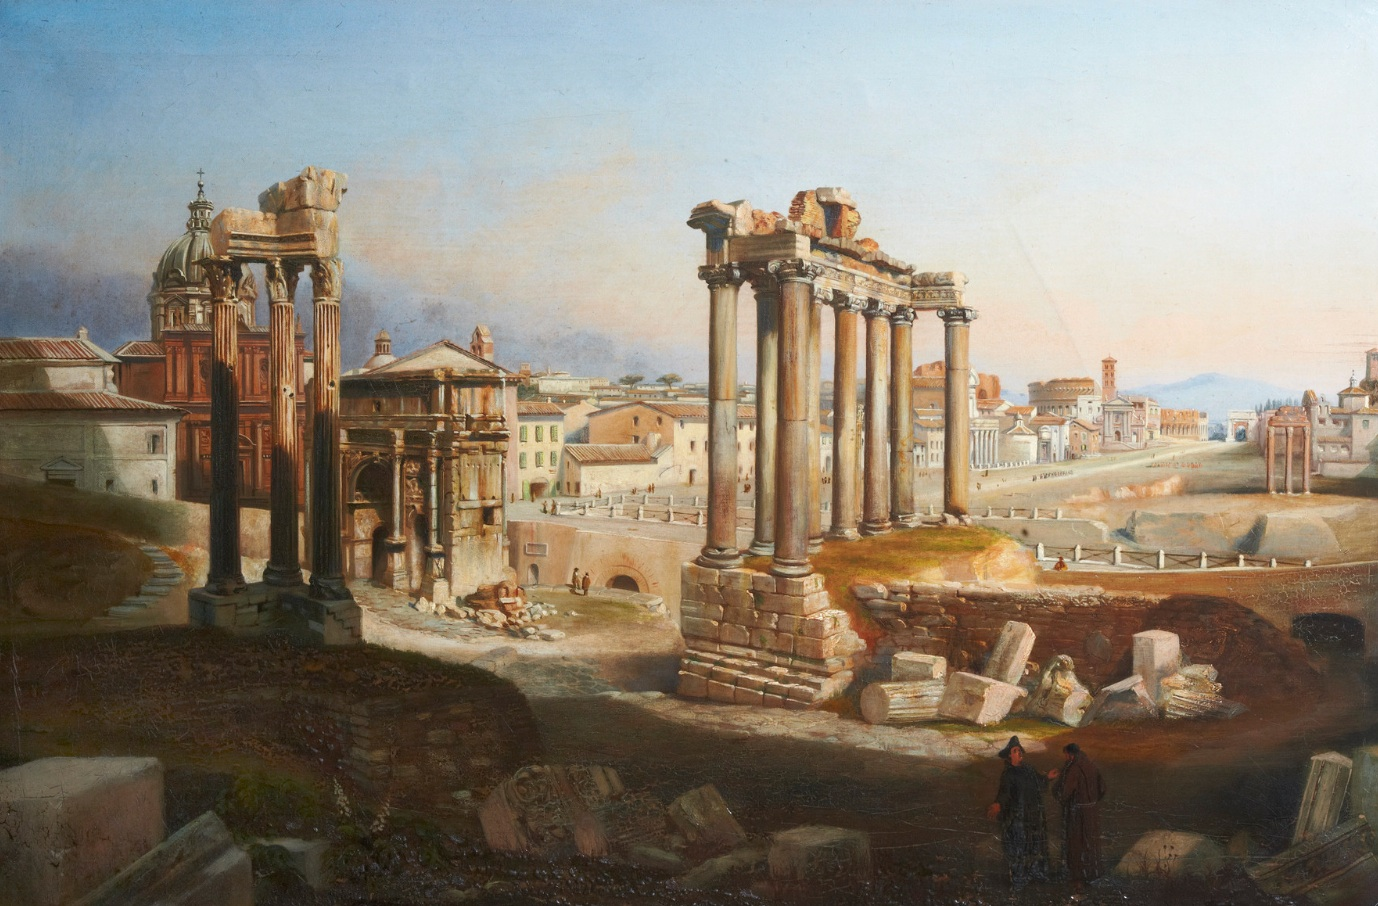 Viva Roma